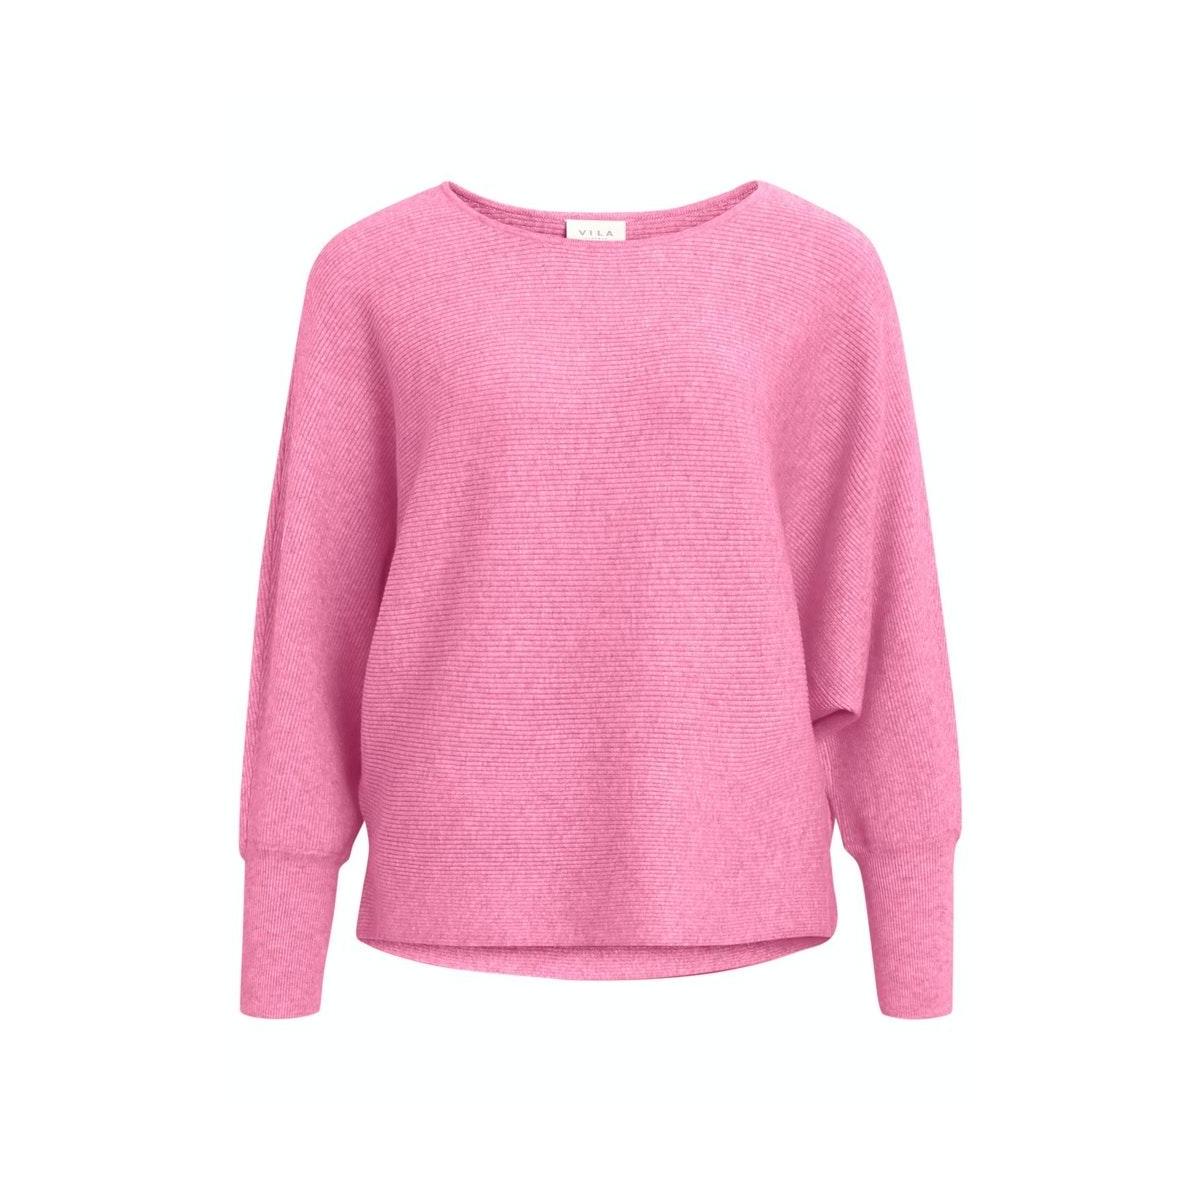 vielasta l/s knit top/2 14060395 vila trui begonia pink/melange